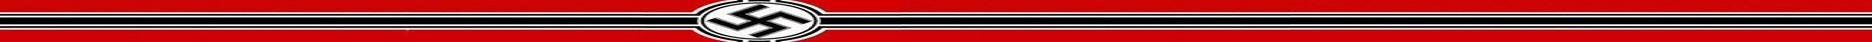 German WWII flag_DivideBAR - Copy - Copy